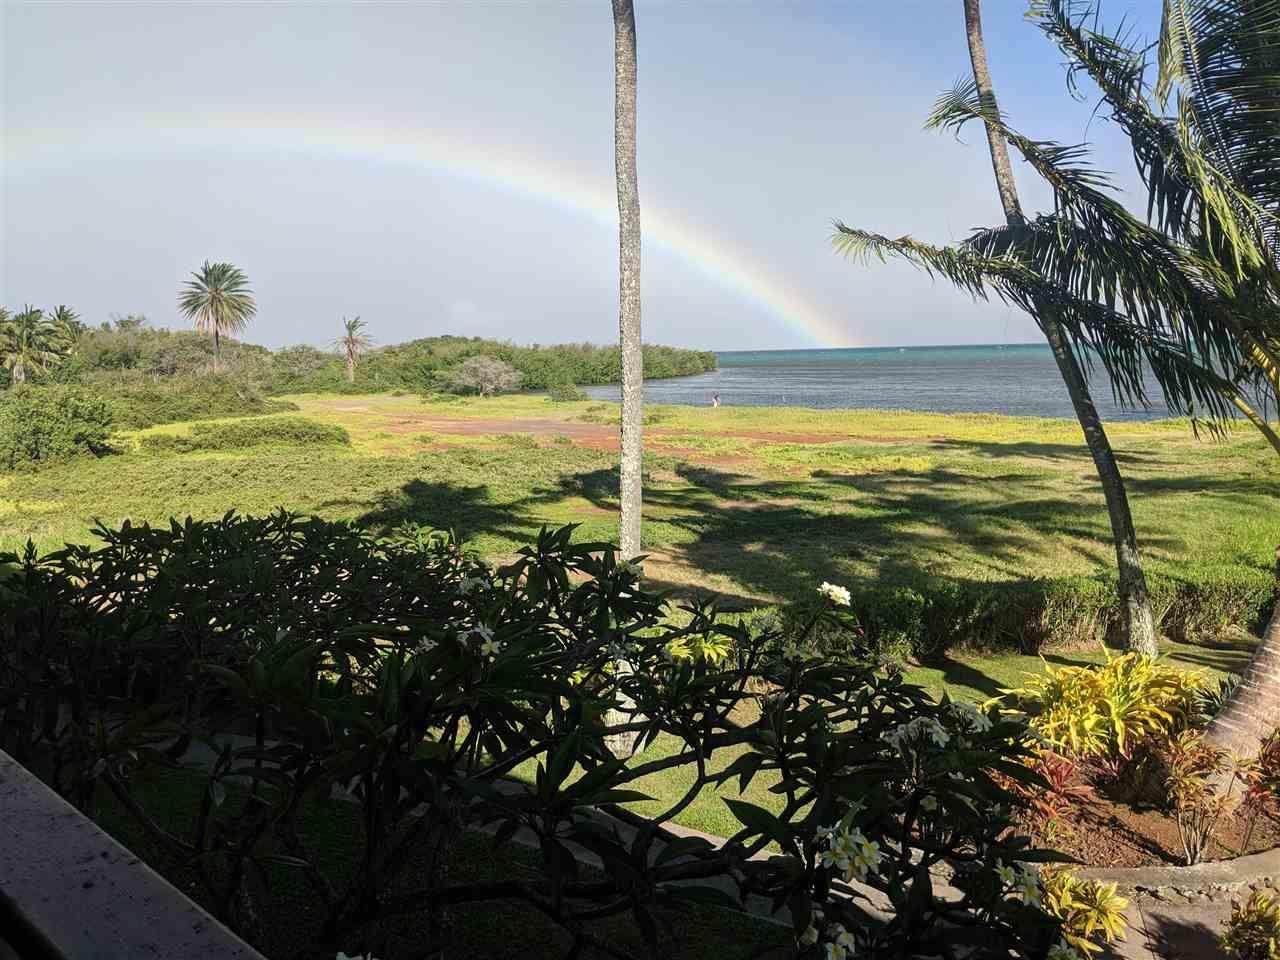 Photo of 7142 Kamehameha V Hwy #C204, Kaunakakai, HI 96748 (MLS # 382624)